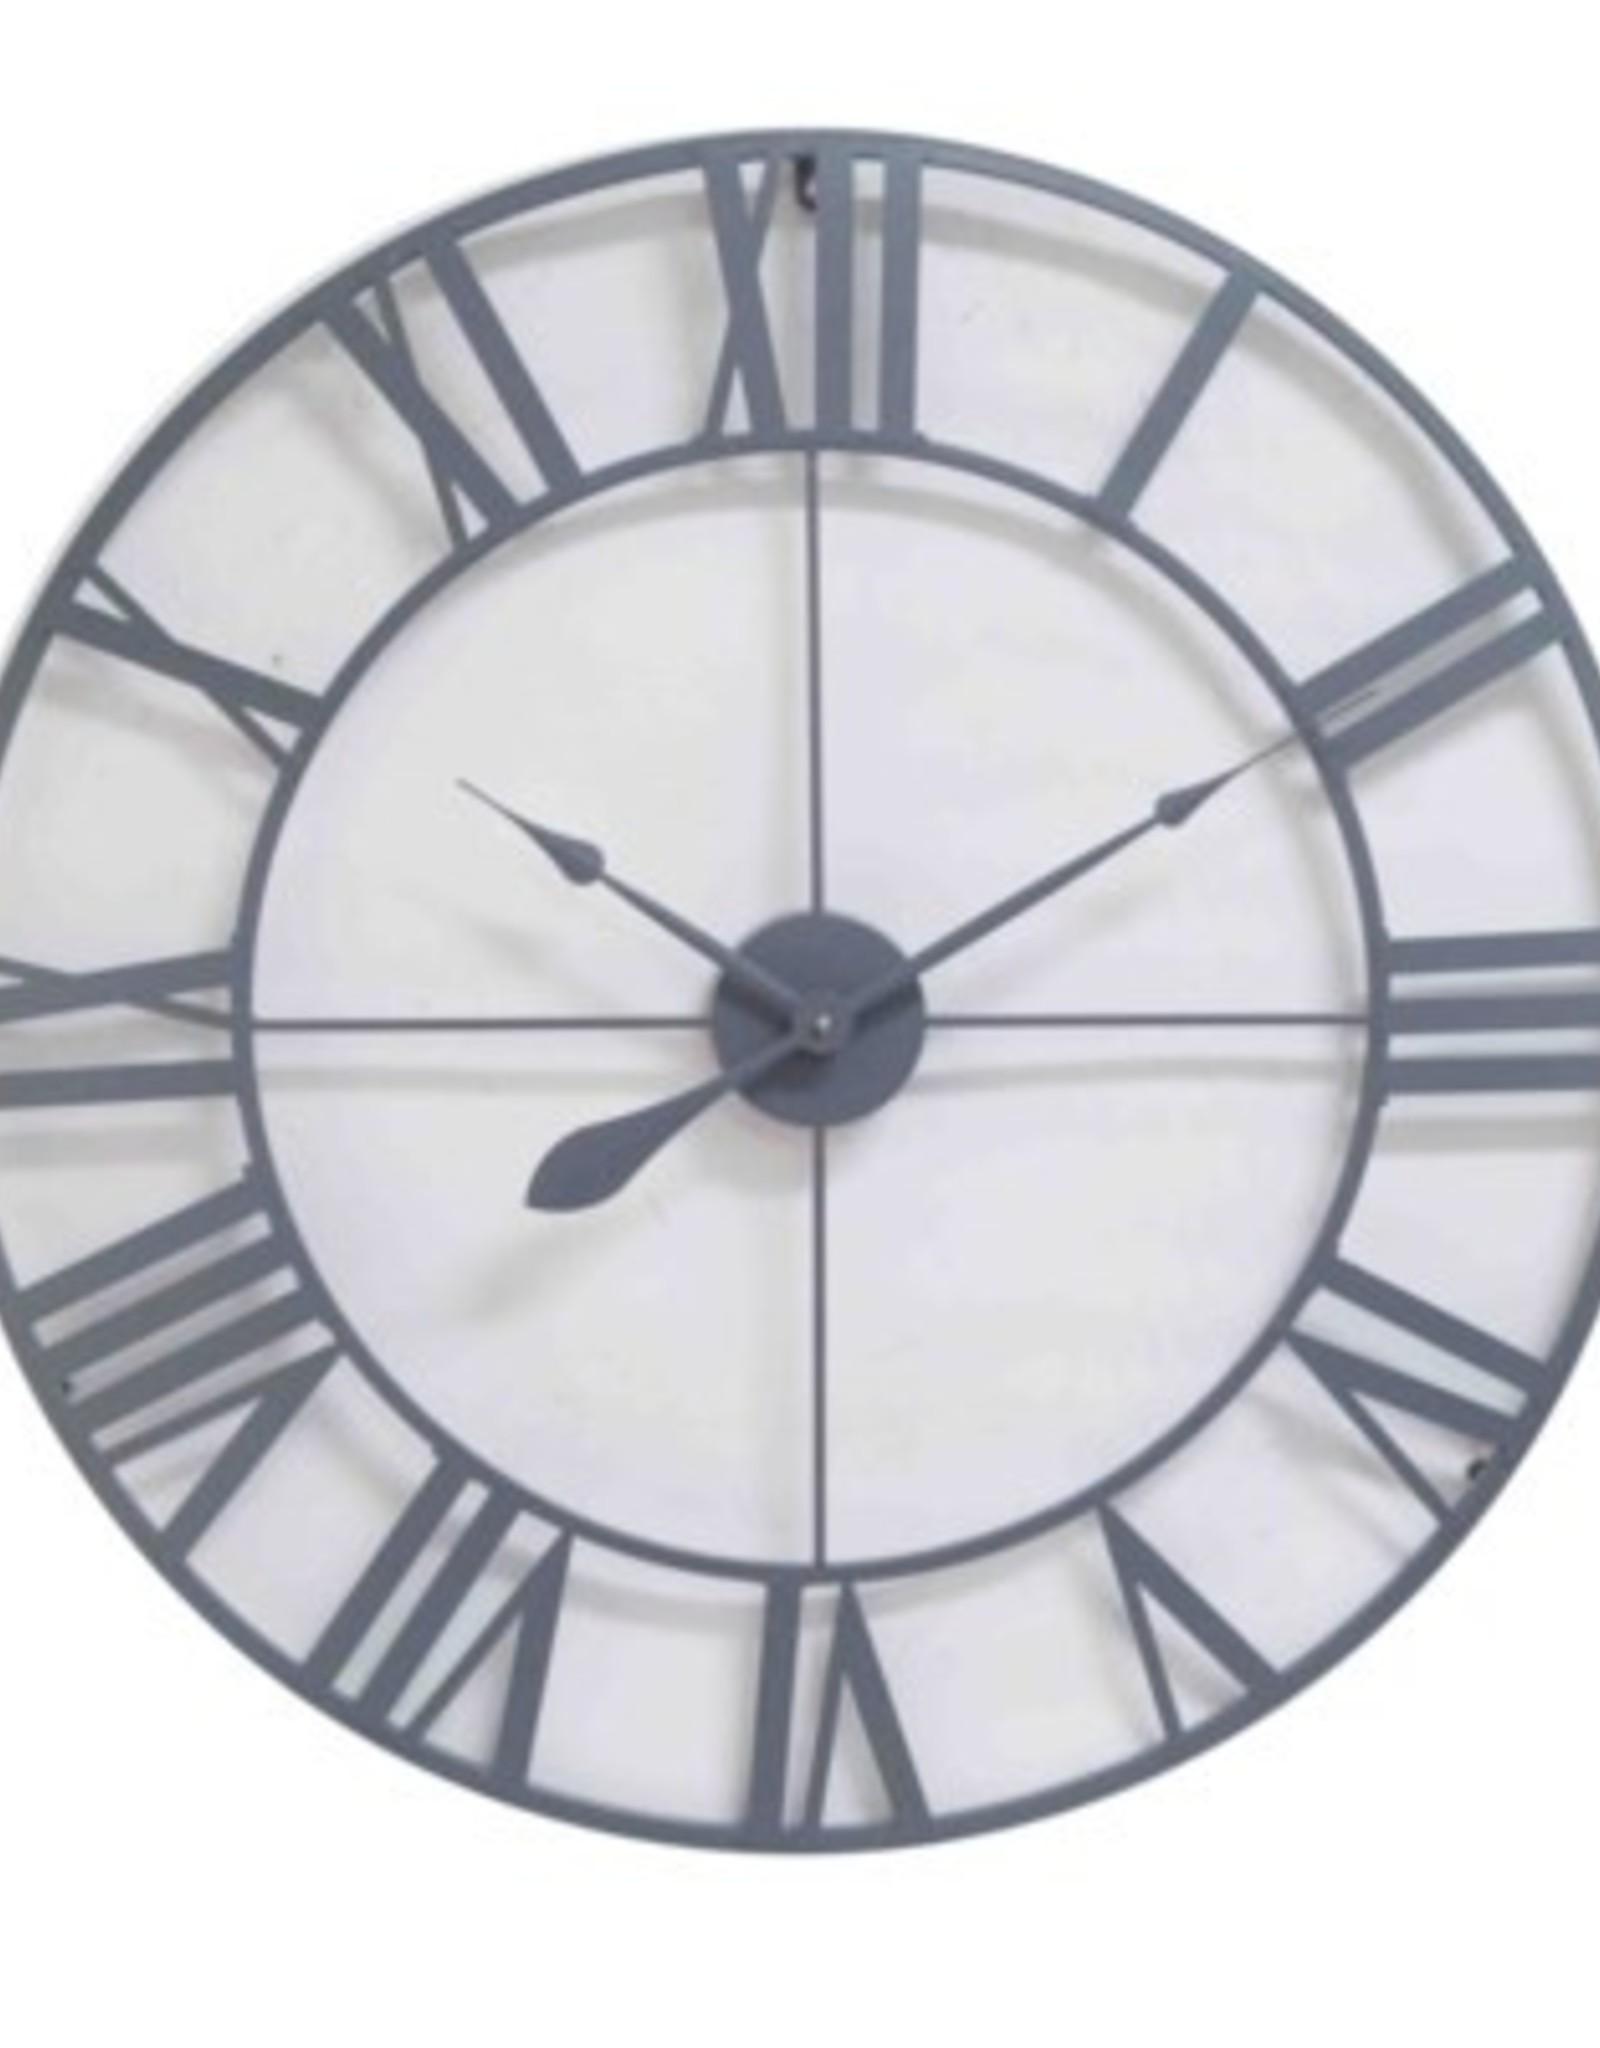 Clocks CJ Toni Grey Roman